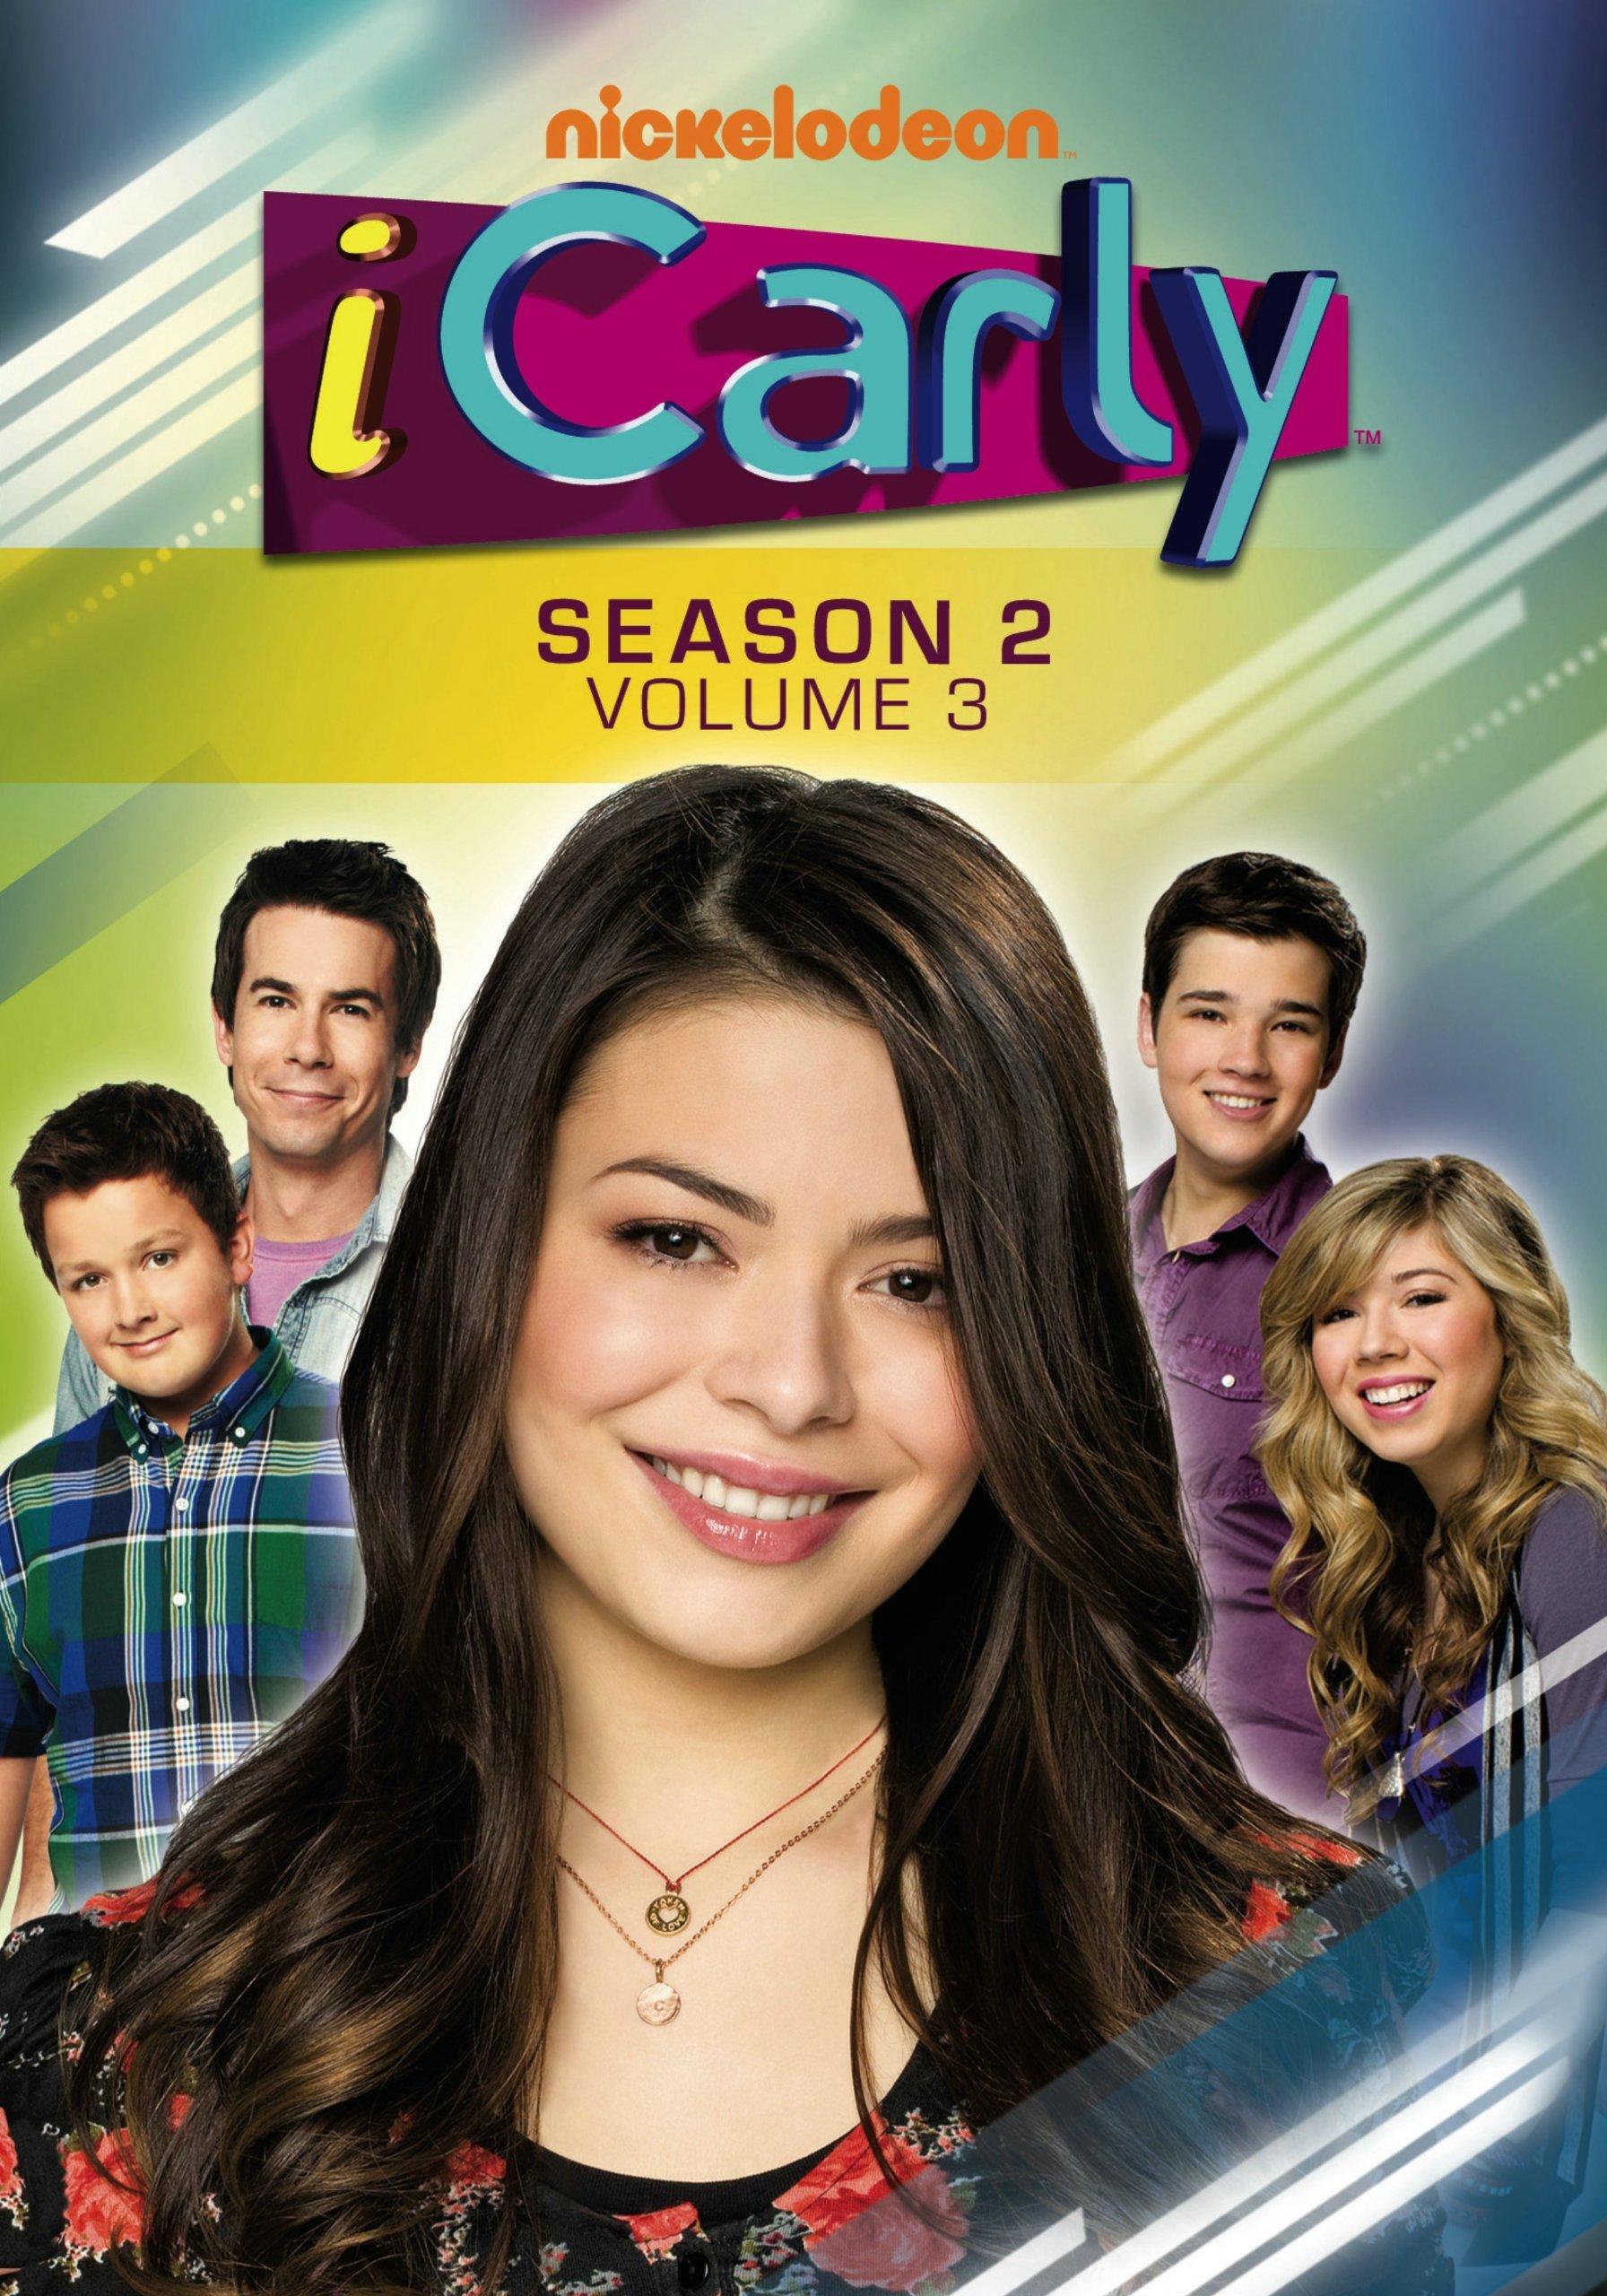 DVD : iCarly: Season 2, Vol. 3 (Full Frame, 3 Disc)